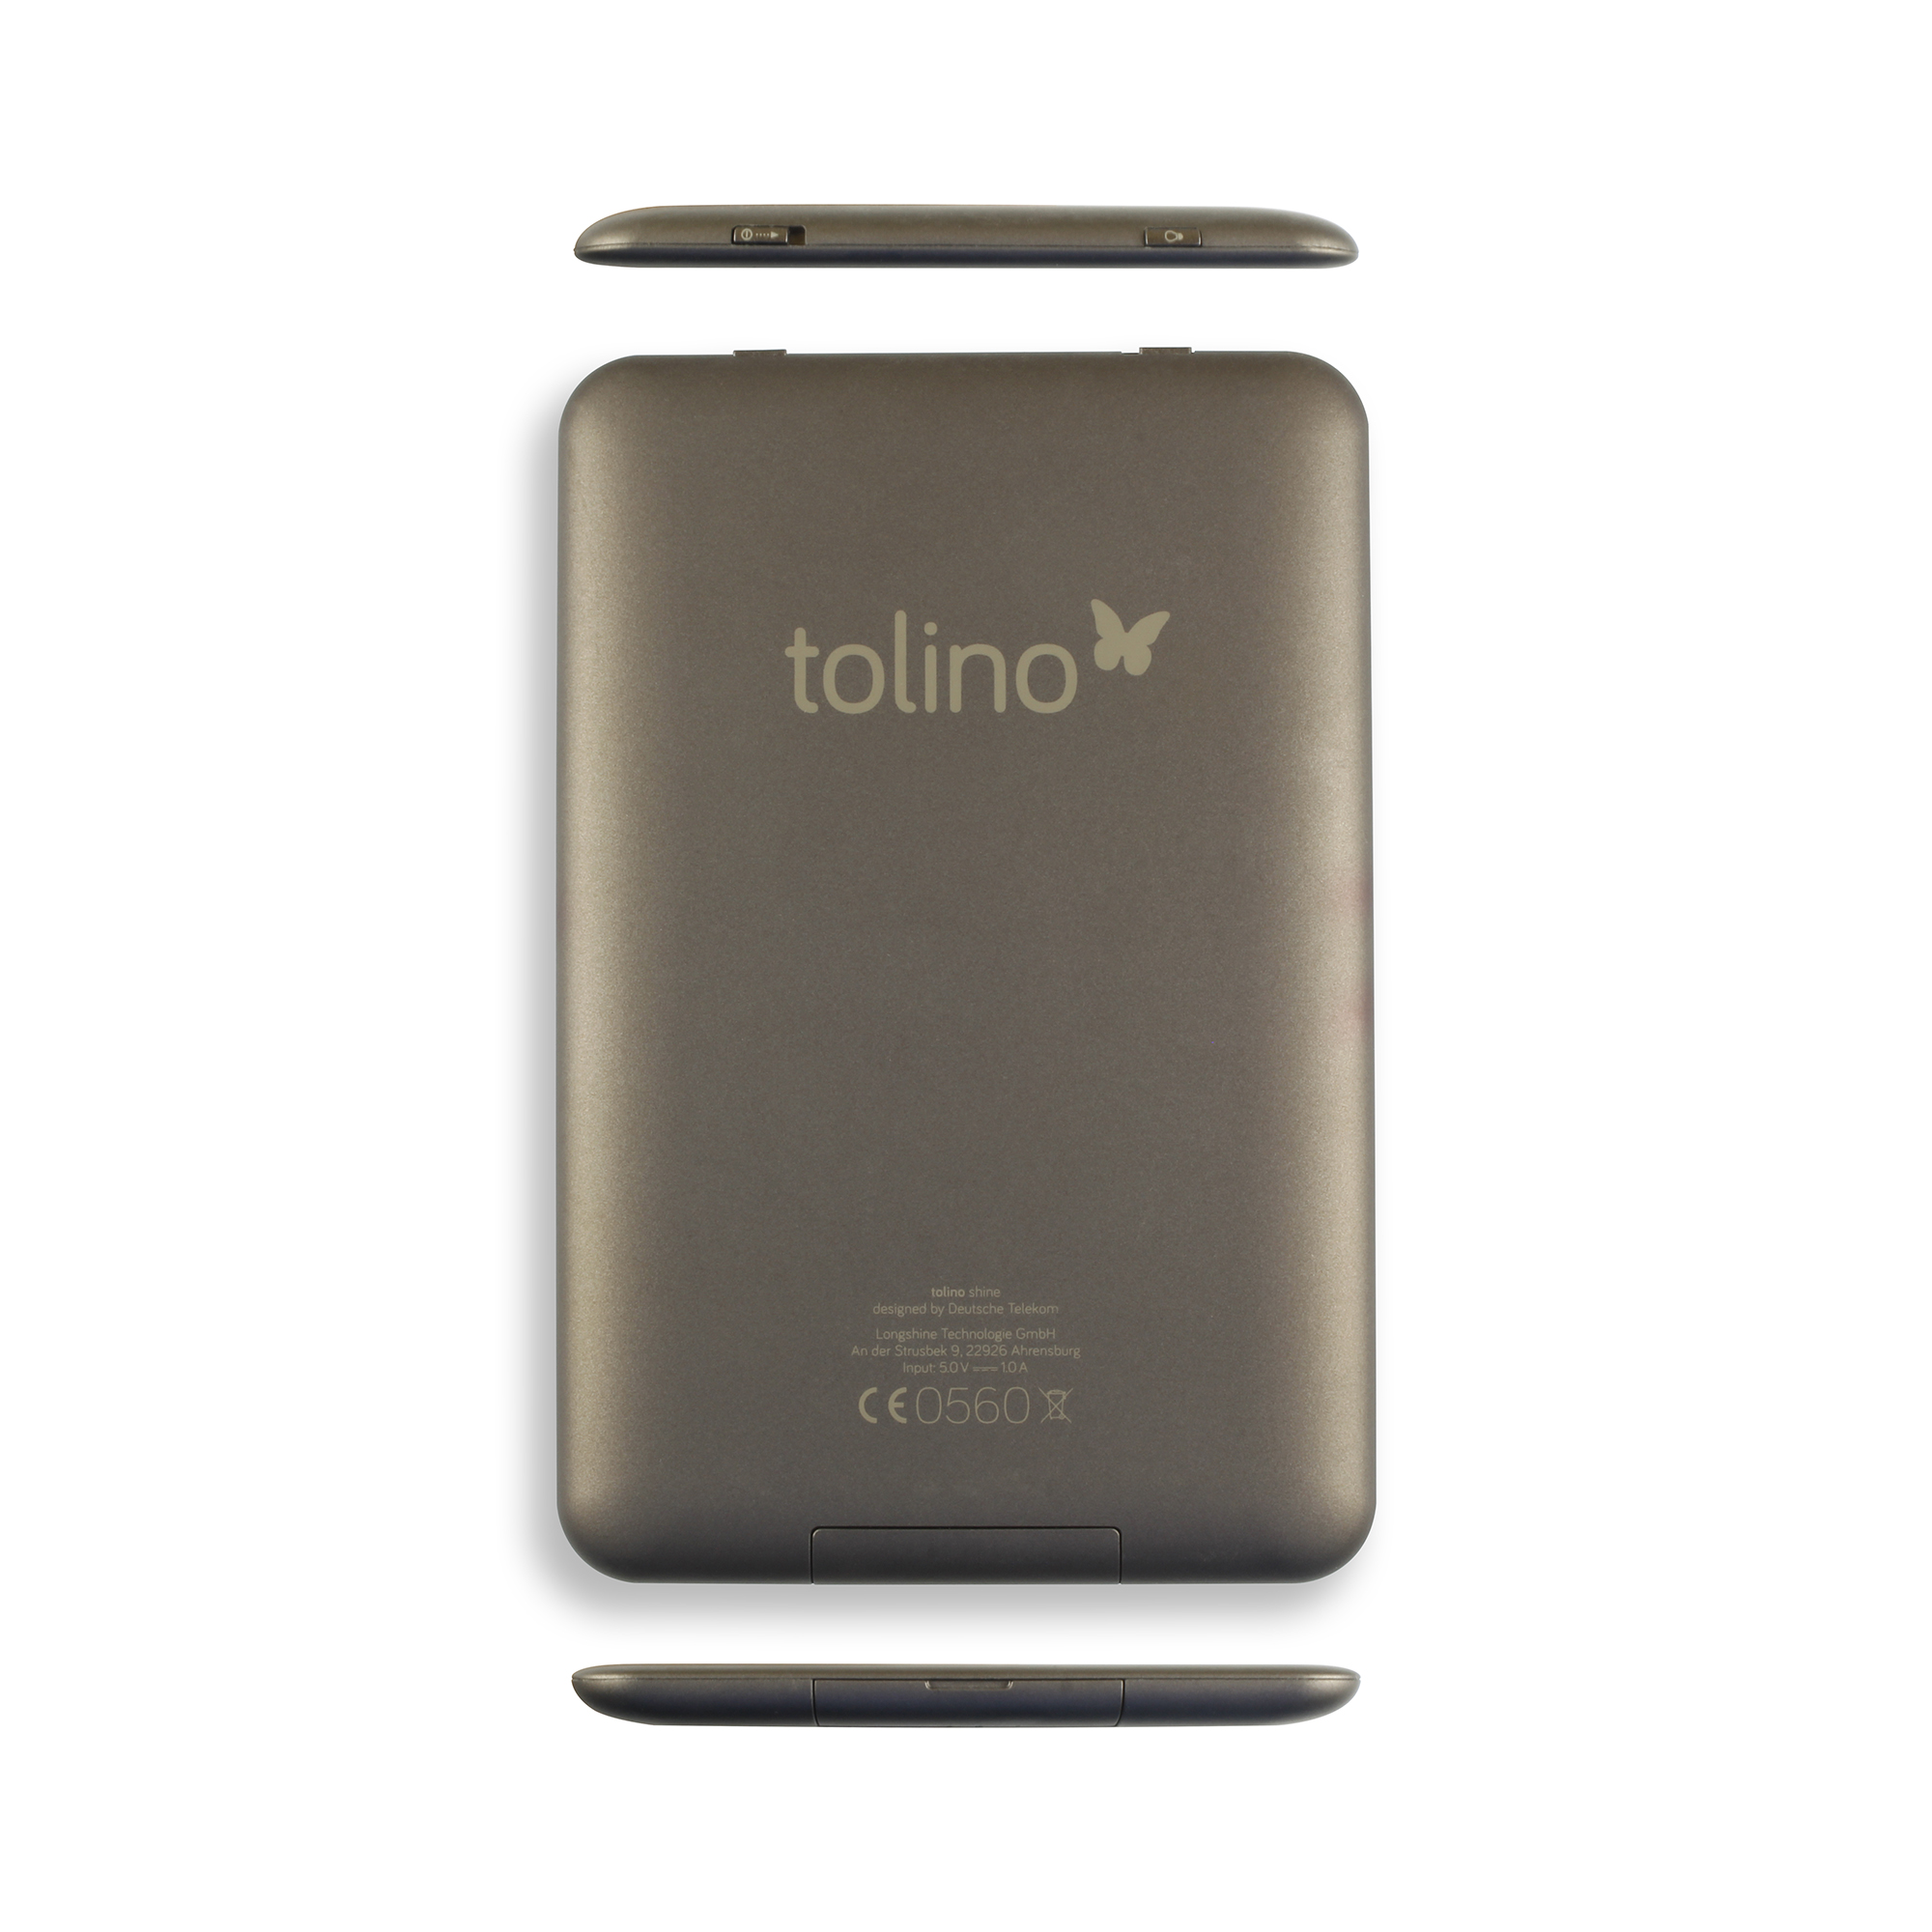 Image 4 - Built in Light e Book Reader WiFi ebook Tolino Shine e ink 6 inch  Touch Screen 1024x758 electronic Book ReadereBook Reader   -